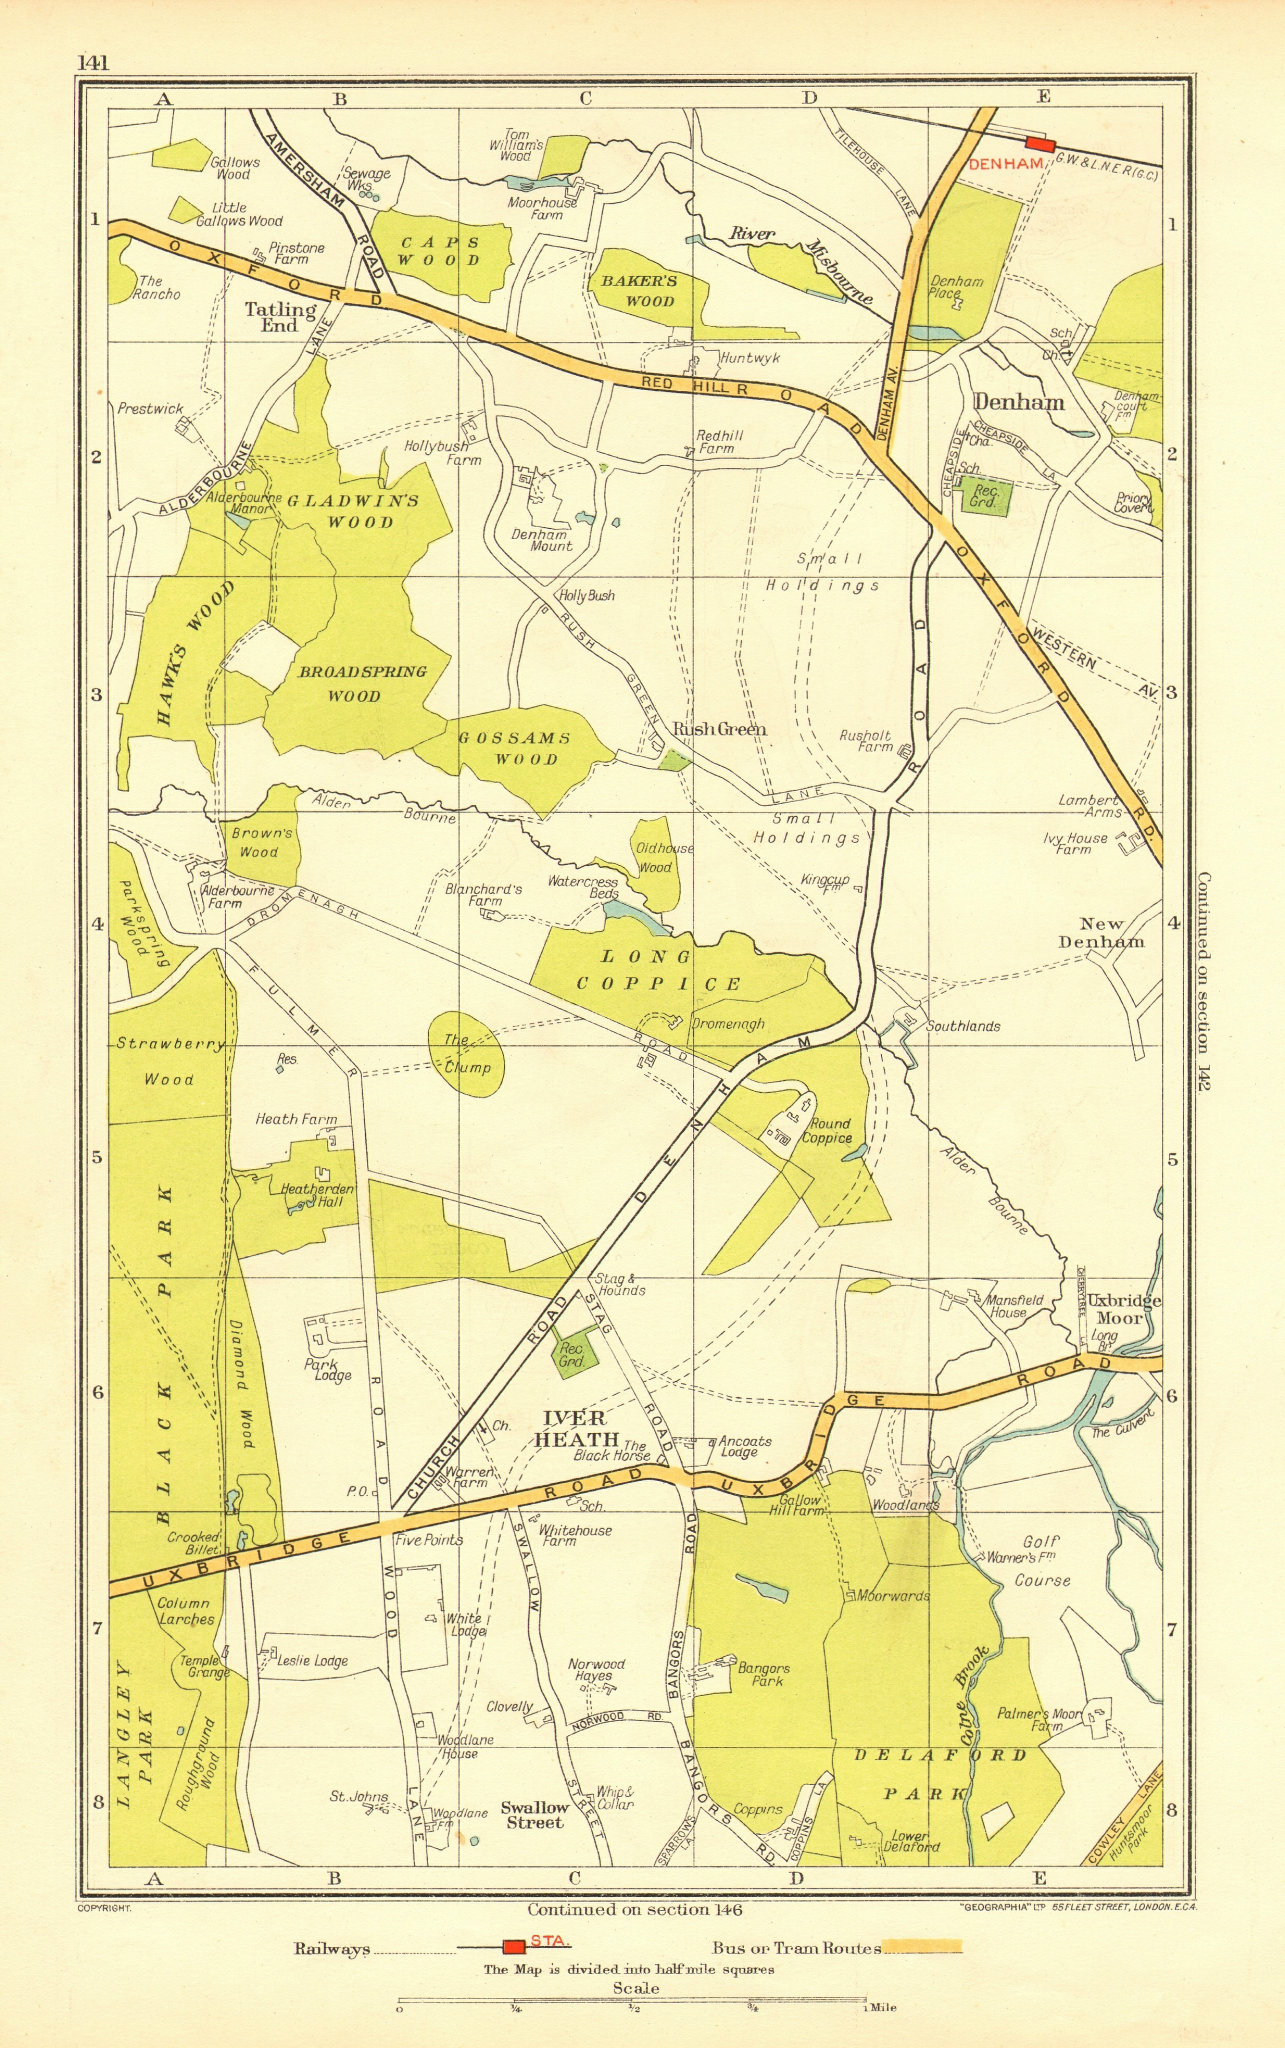 SOUTH BUCKS. Iver Heath Denham Uxbridge Tatling End Baker's Wood 1937 old map